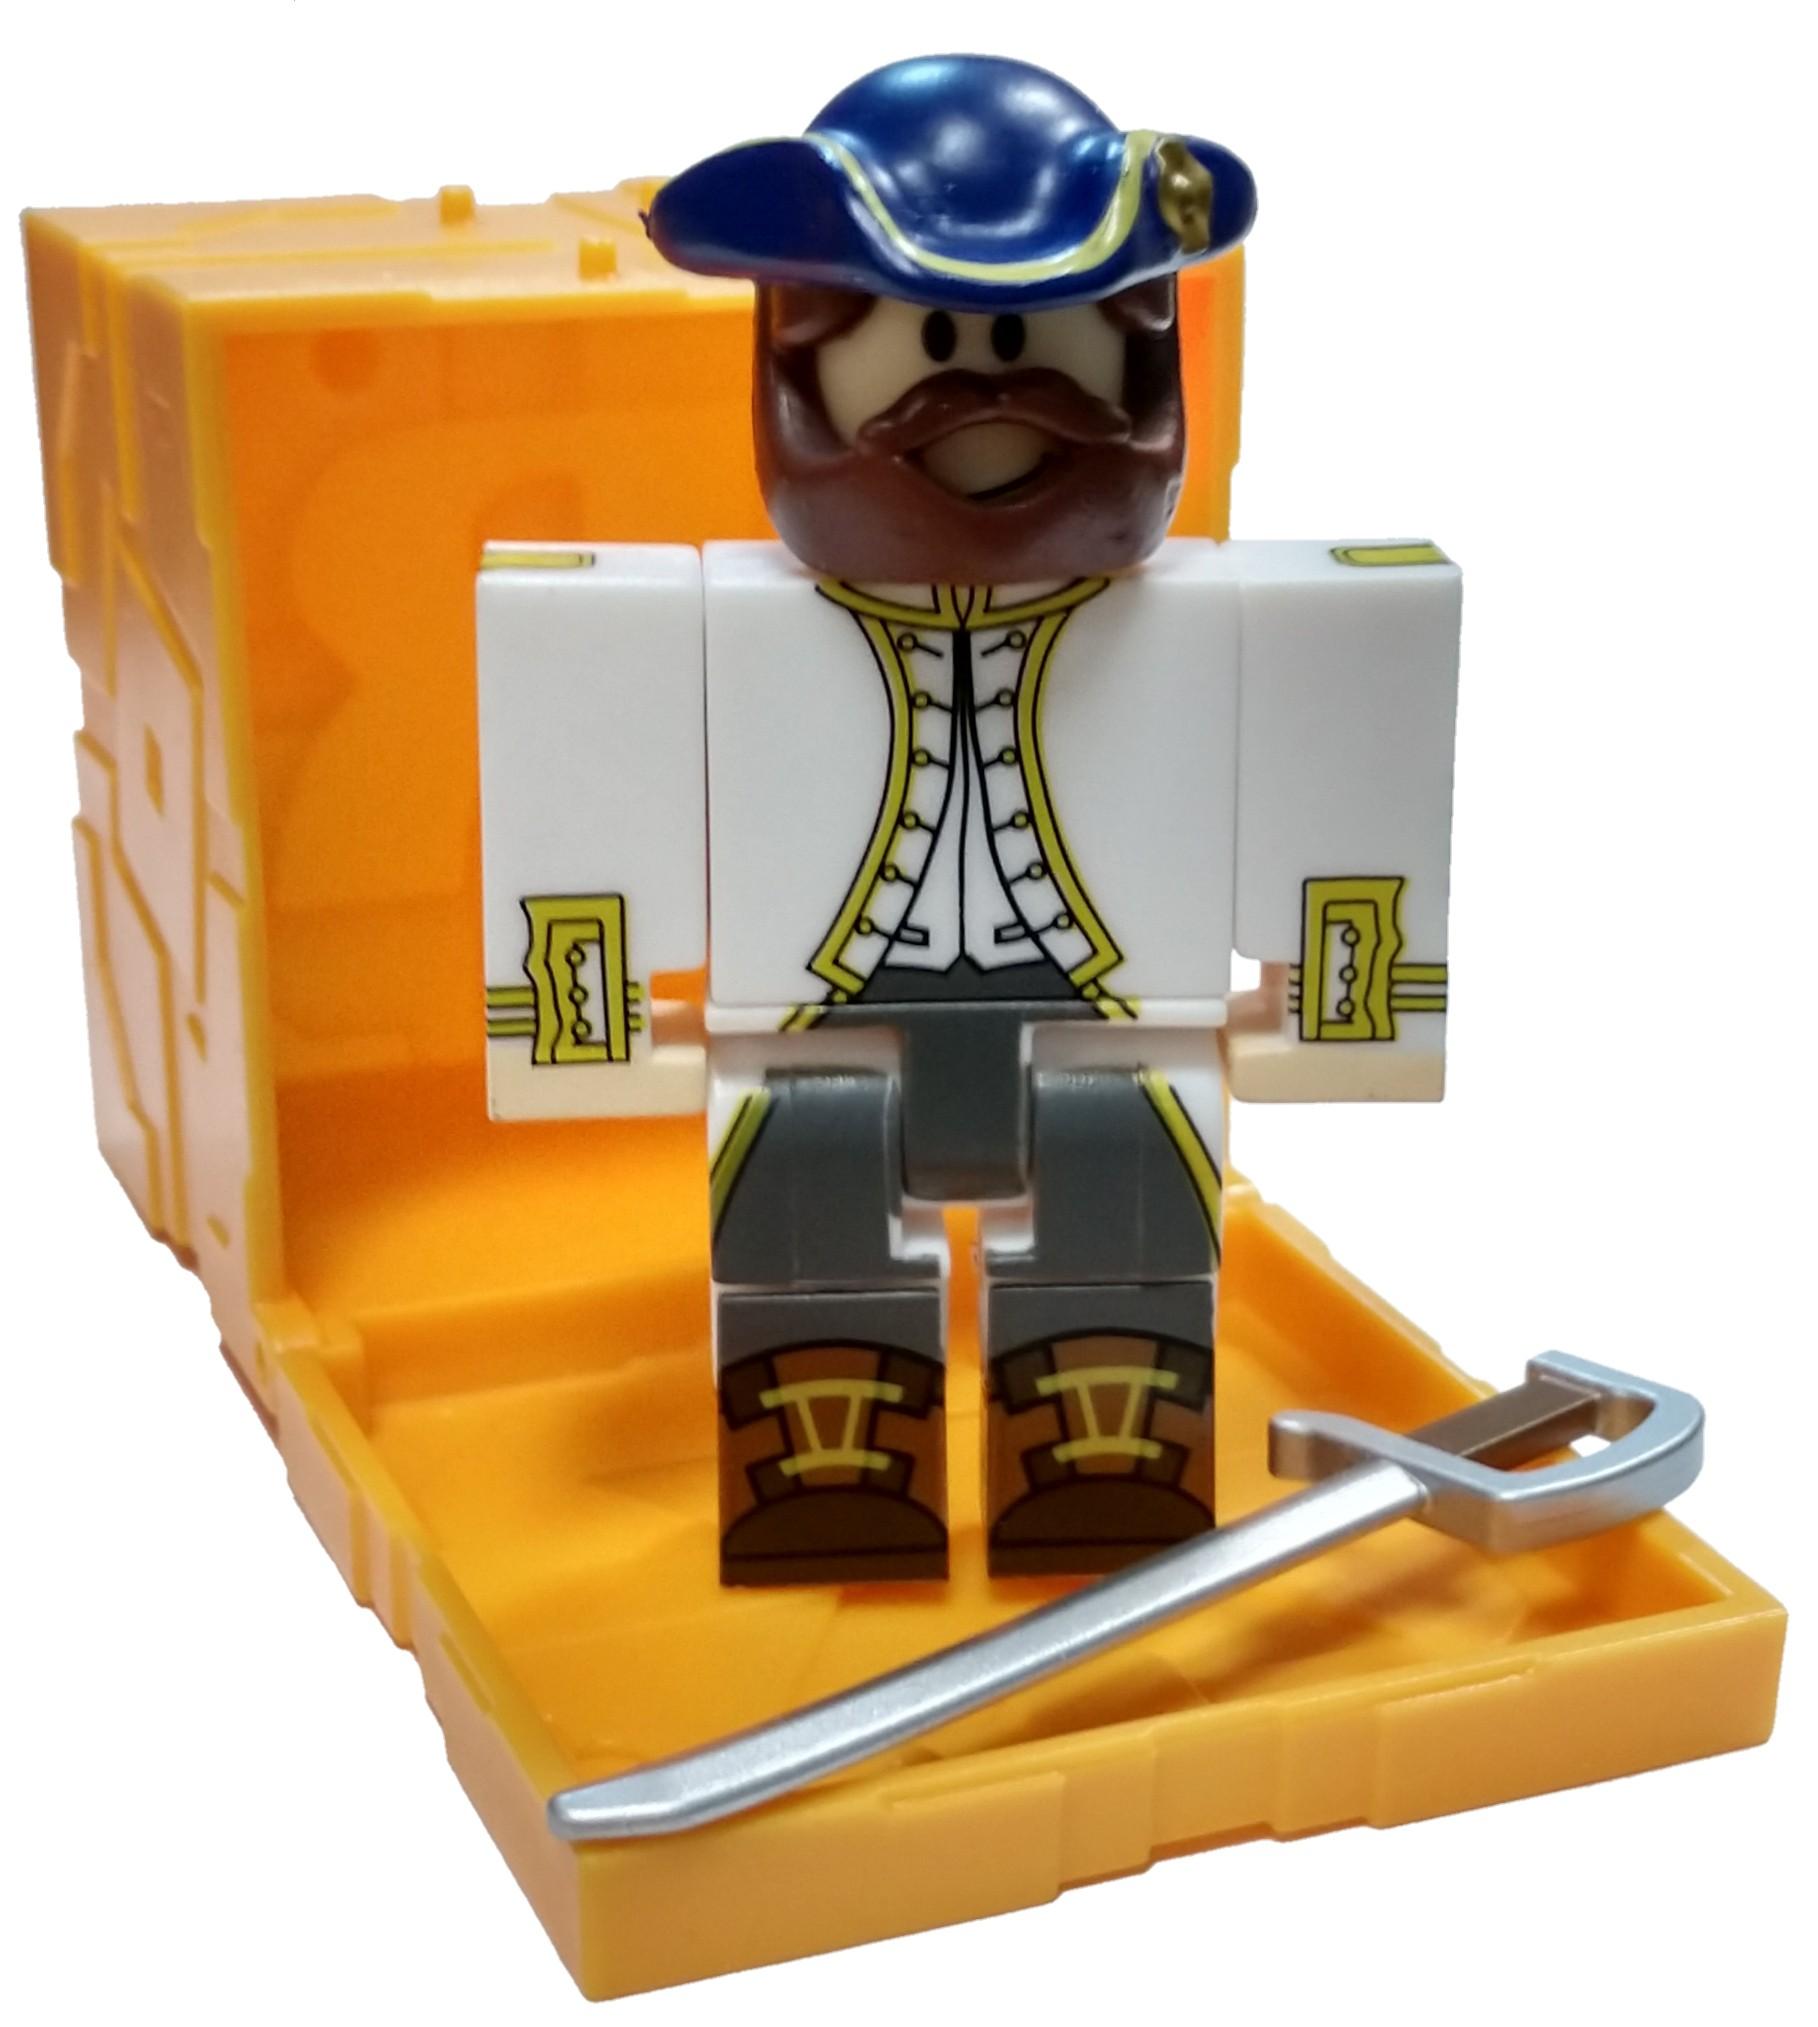 Haggie125 Roblox Mini Figure W Virtual Game Code Series 2 New Ebay - Roblox Series 5 Tradelands Whitecrest Admiral Mini Figure Ebay